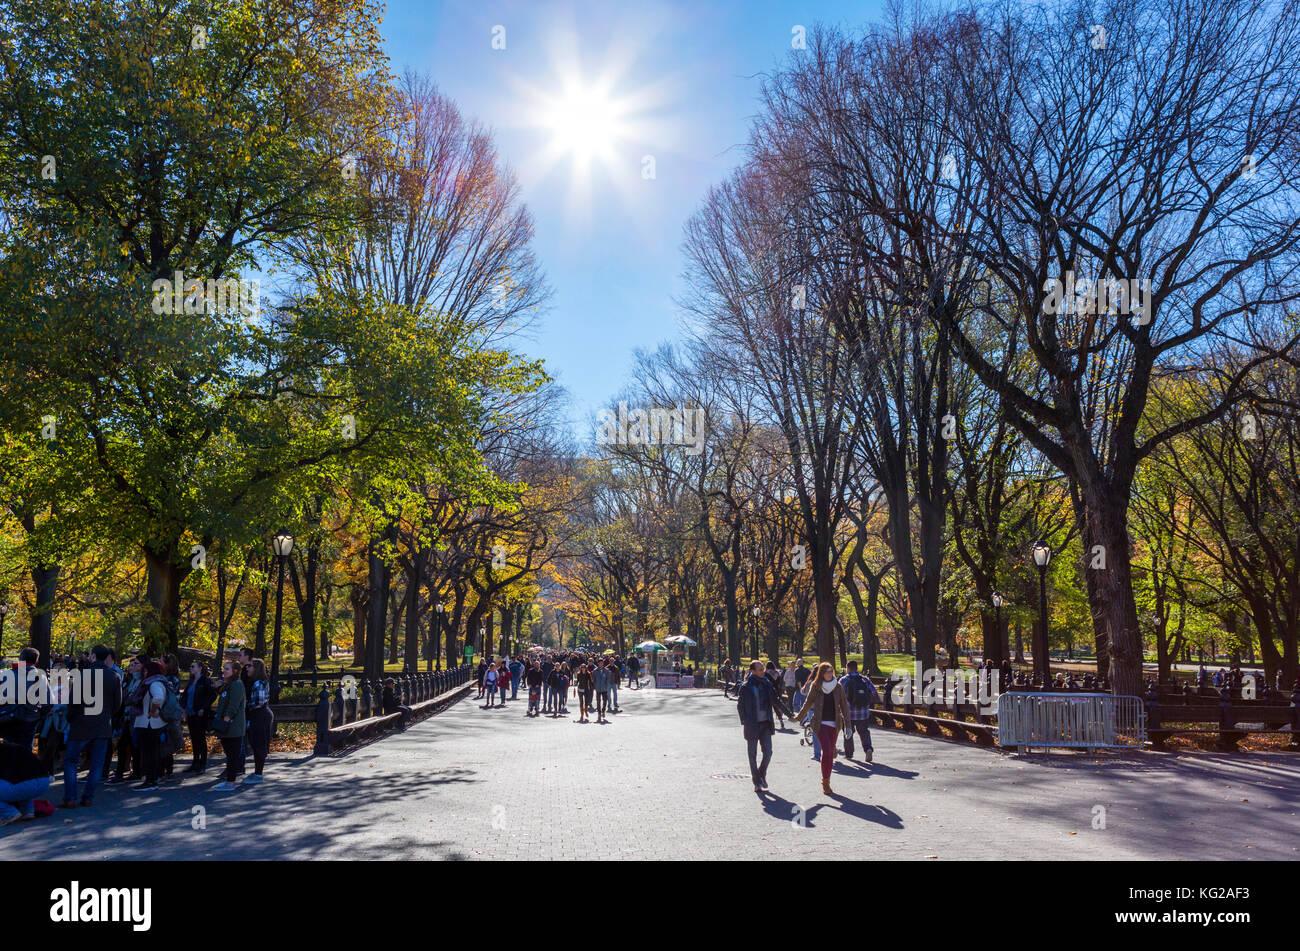 Die Mall, Central Park, New York City, NY, USA Stockbild